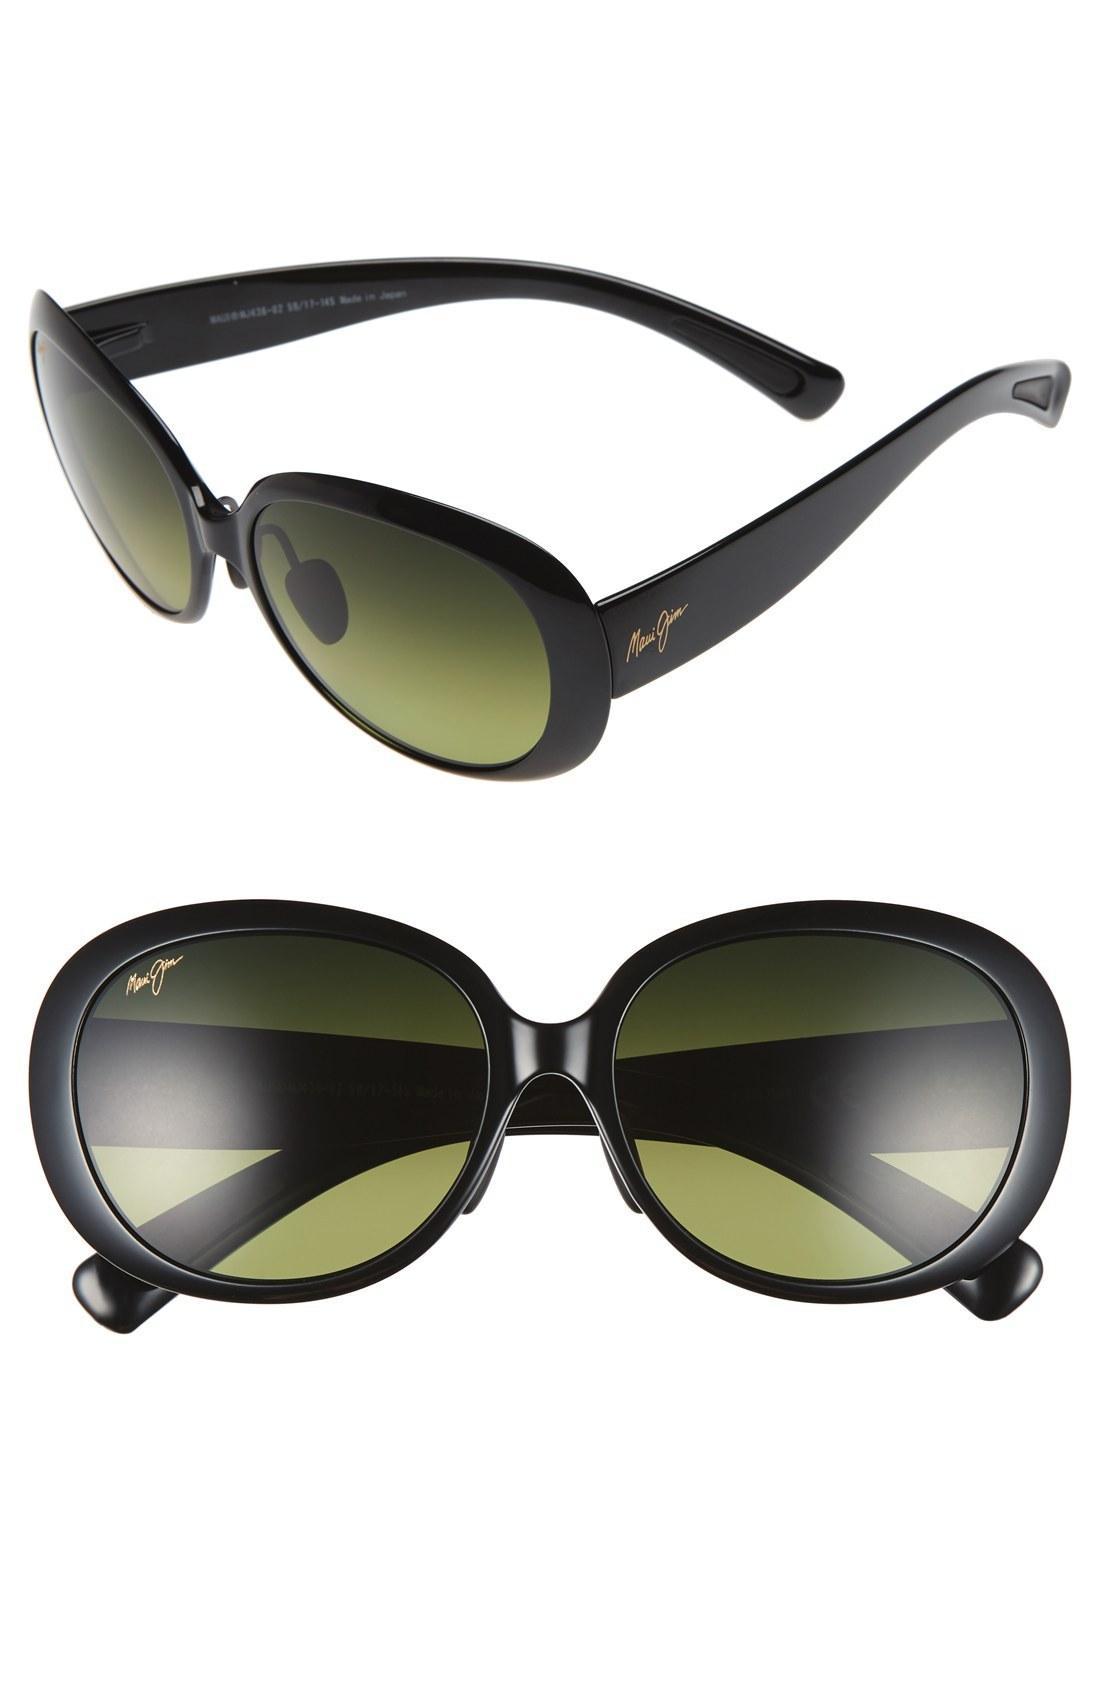 d8a020cbfc MAUI JIM. Nahiku 59Mm Polarizedplus2 Sunglasses - Purple Fade  ...